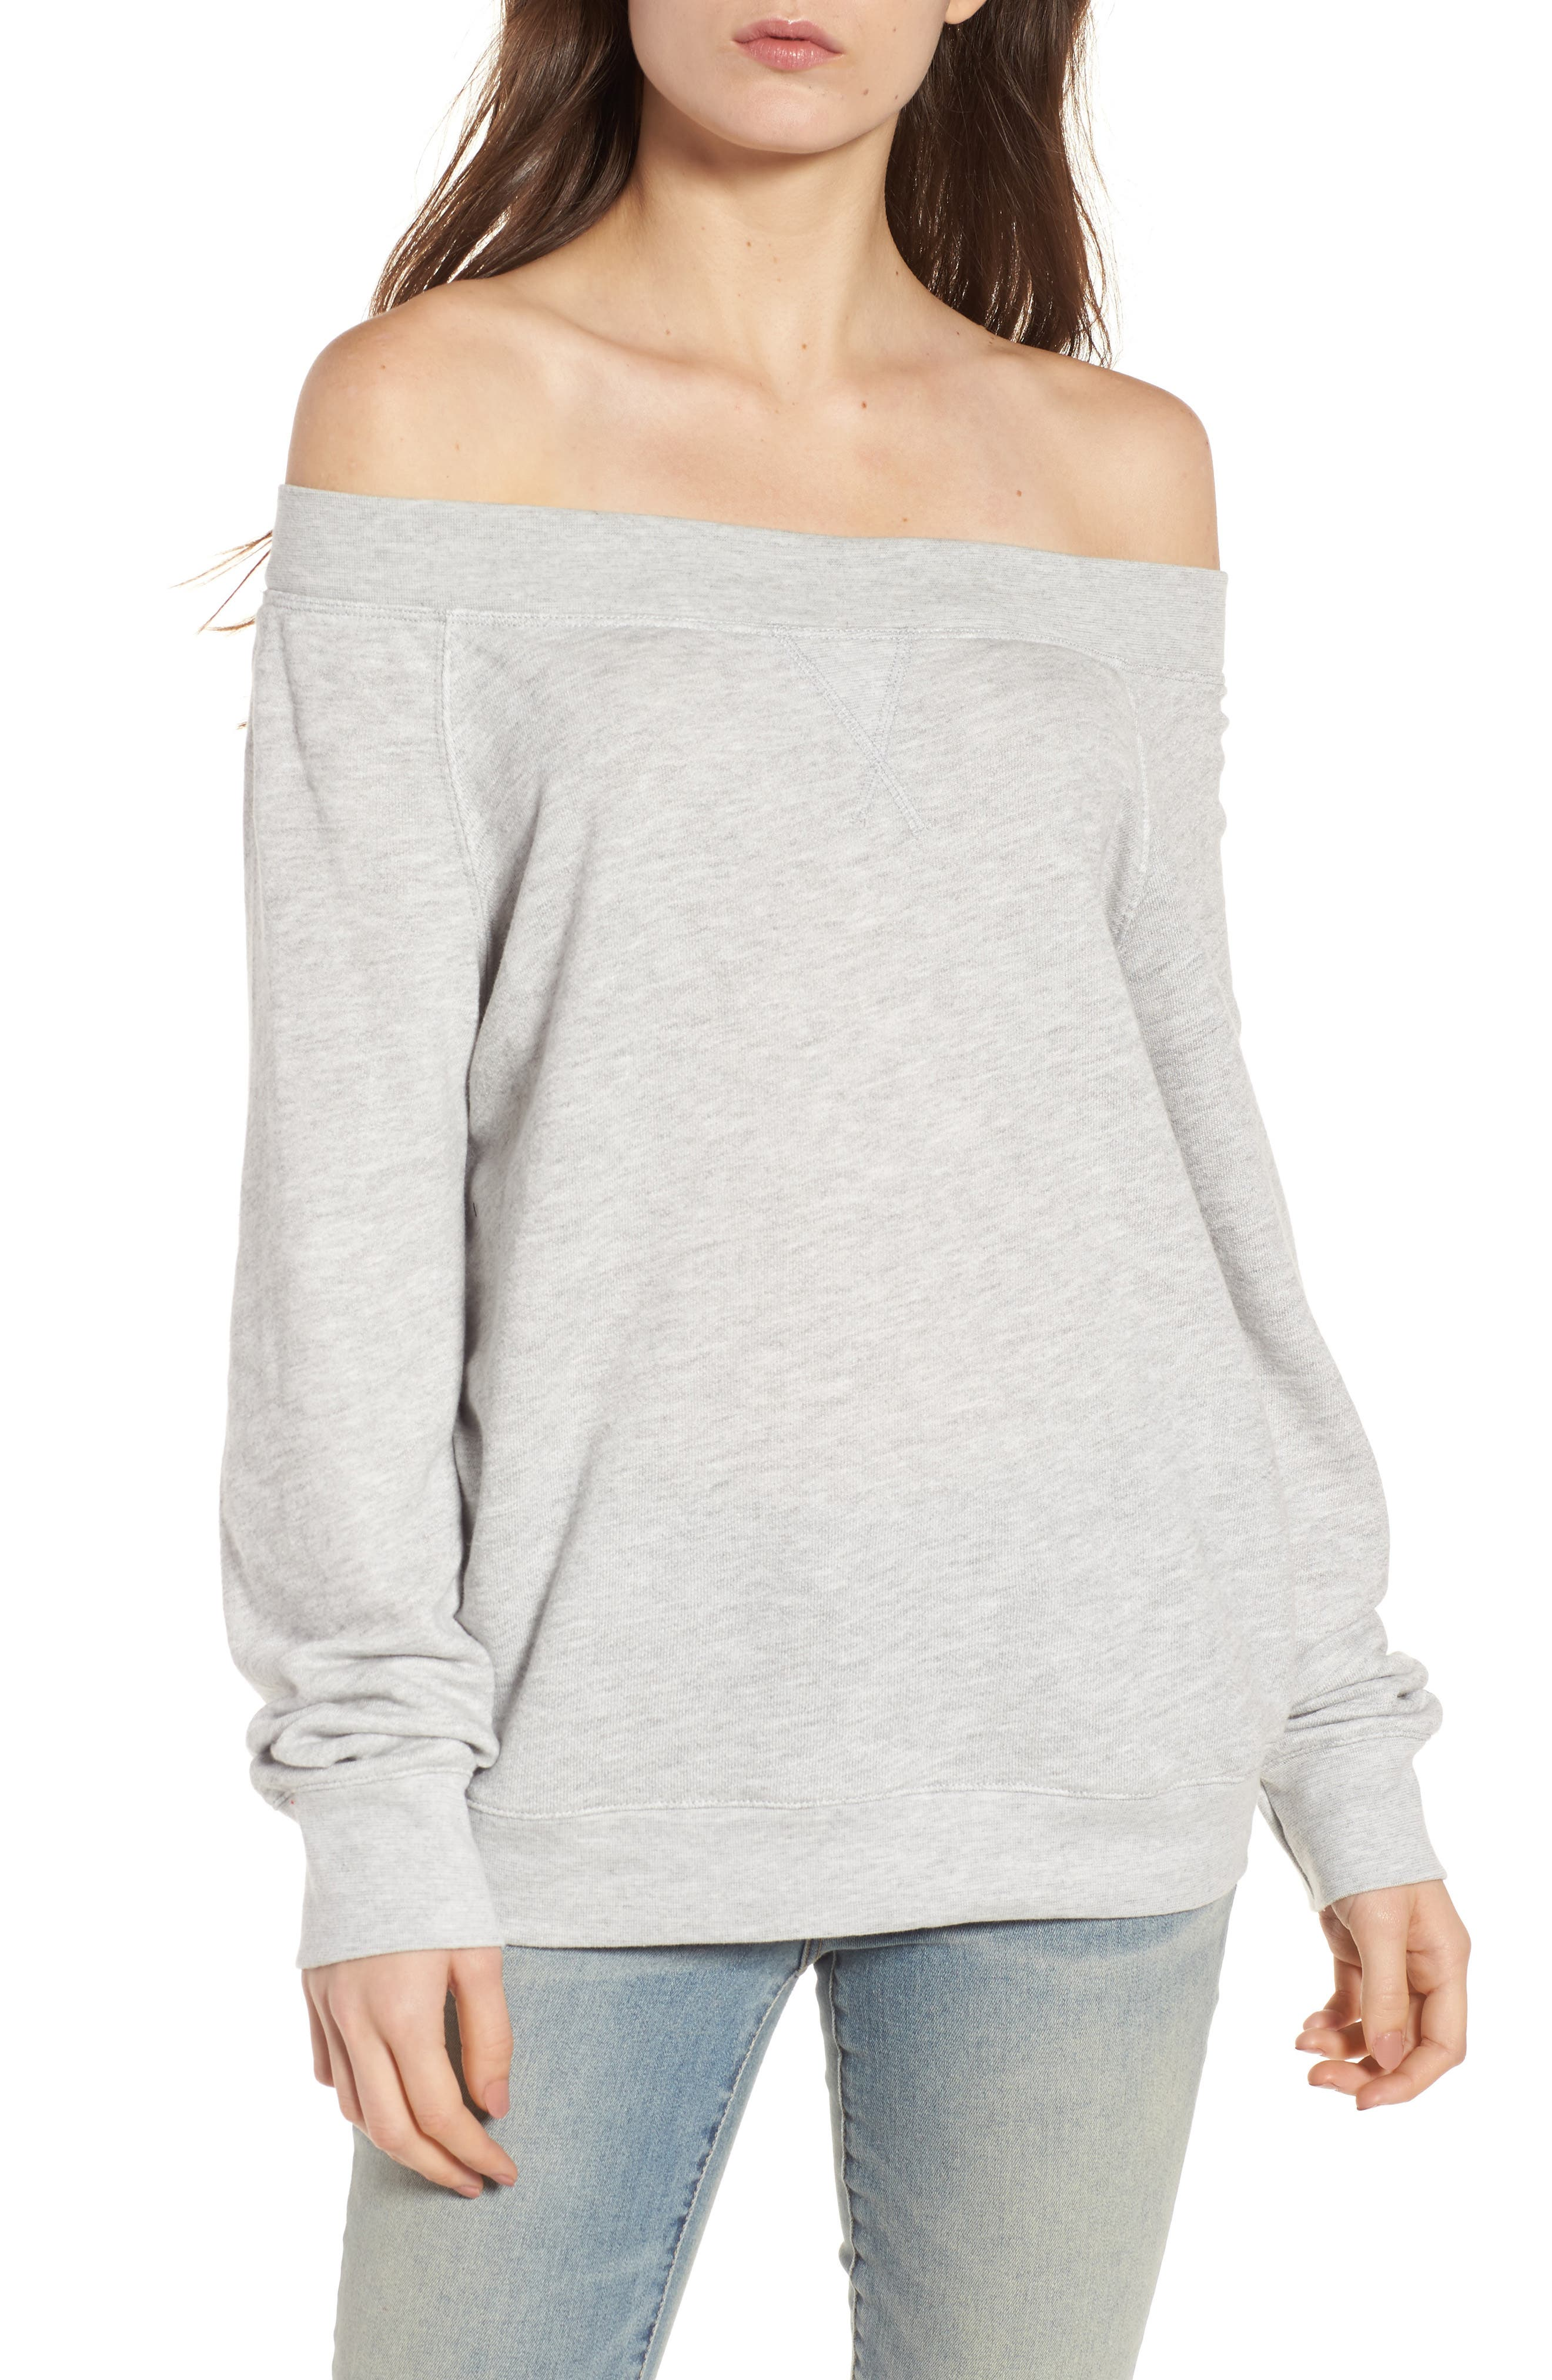 Off the Shoulder Sweatshirt,                             Main thumbnail 1, color,                             Grey Heather